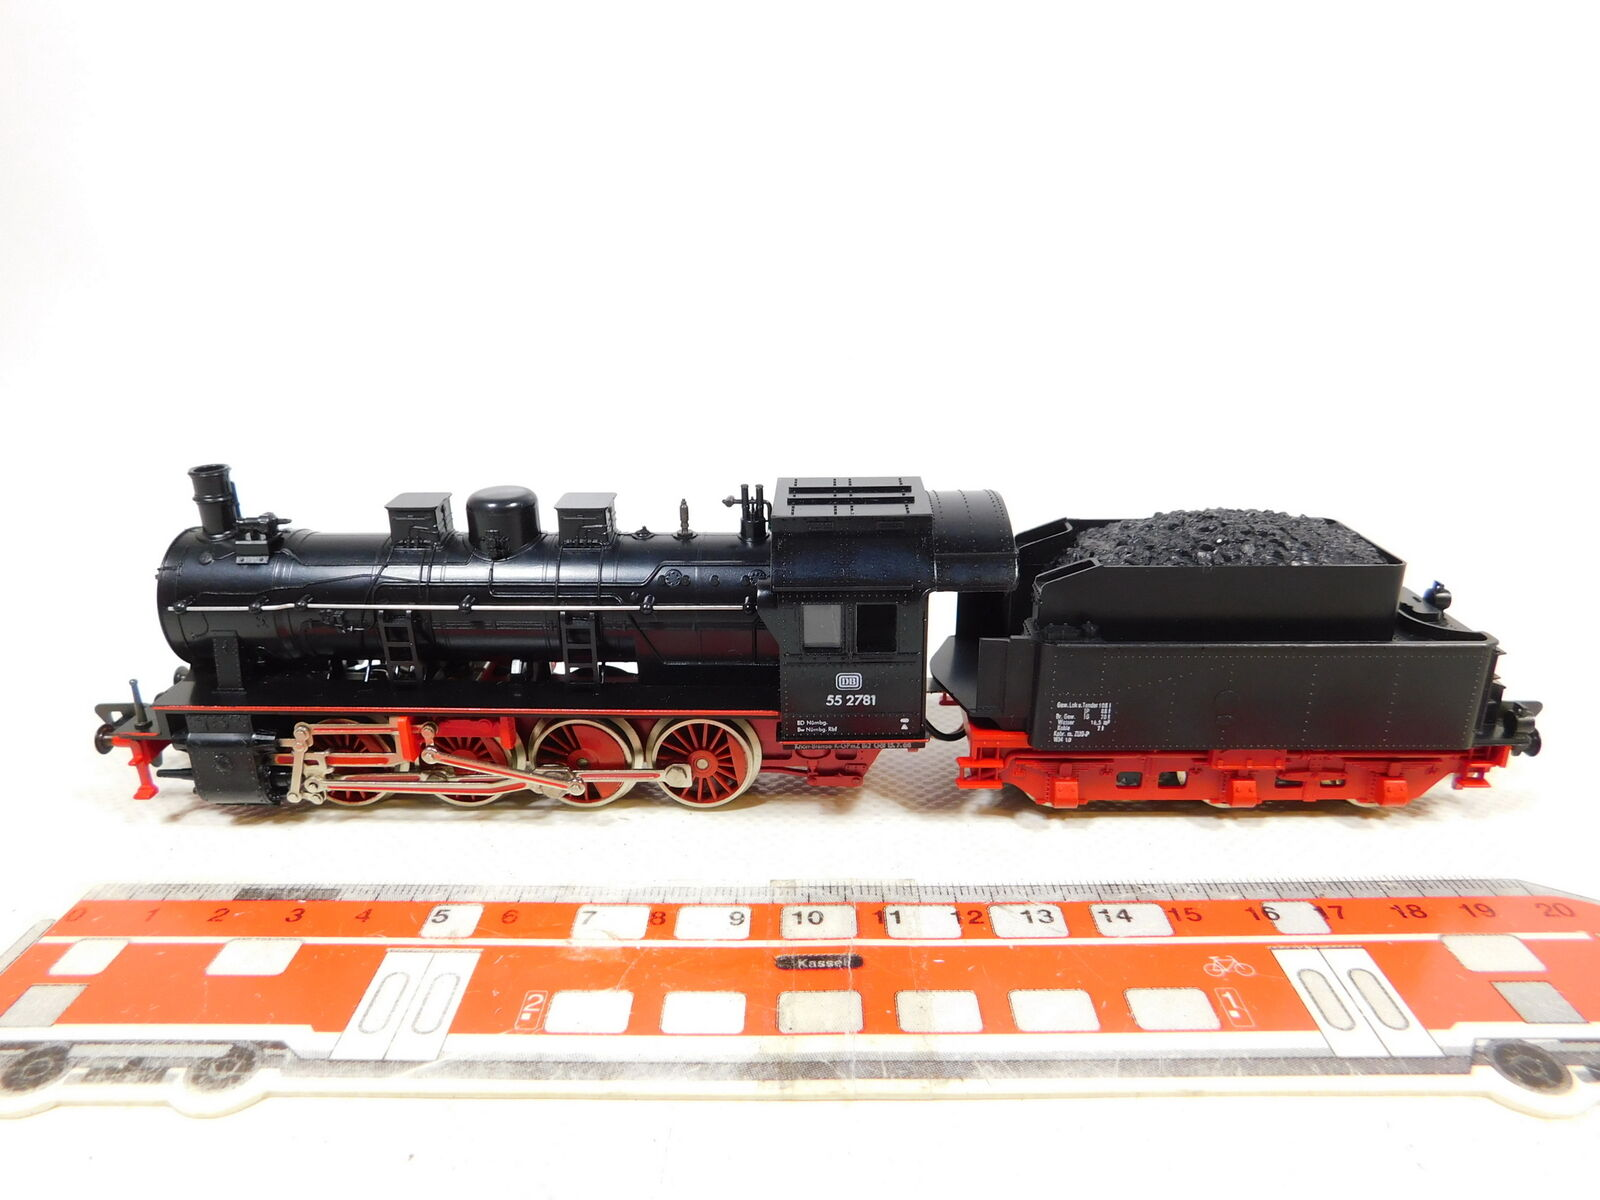 Cd185-1  Fleischmann h0 dc 4145 máquina de vapor vapor locomotora 55 2781 DB, Neuw